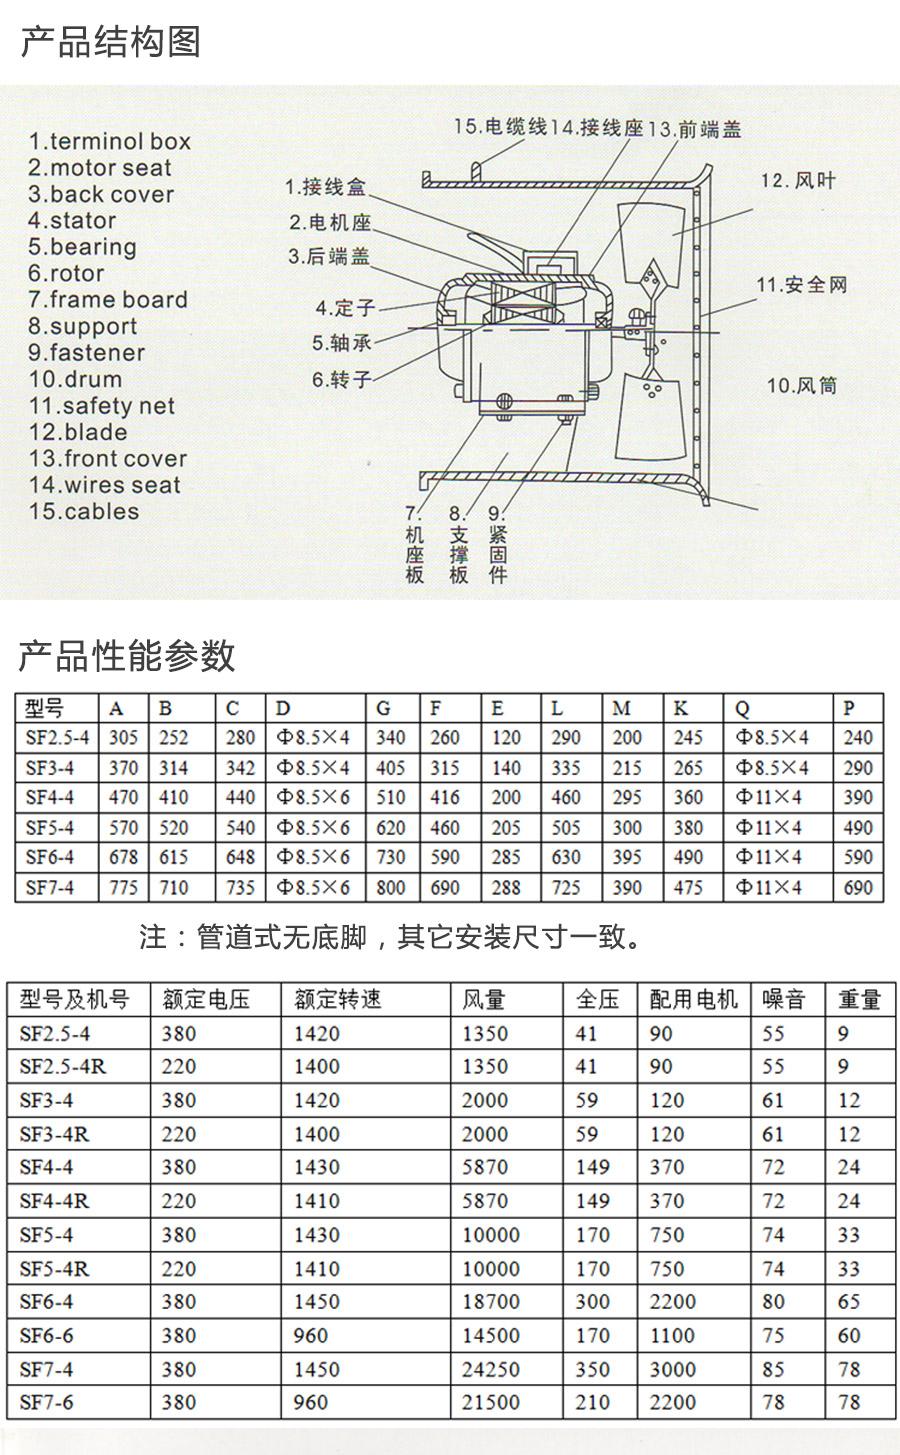 SF6#三相岗位式型号电机安装和尺寸与外形尺寸图8